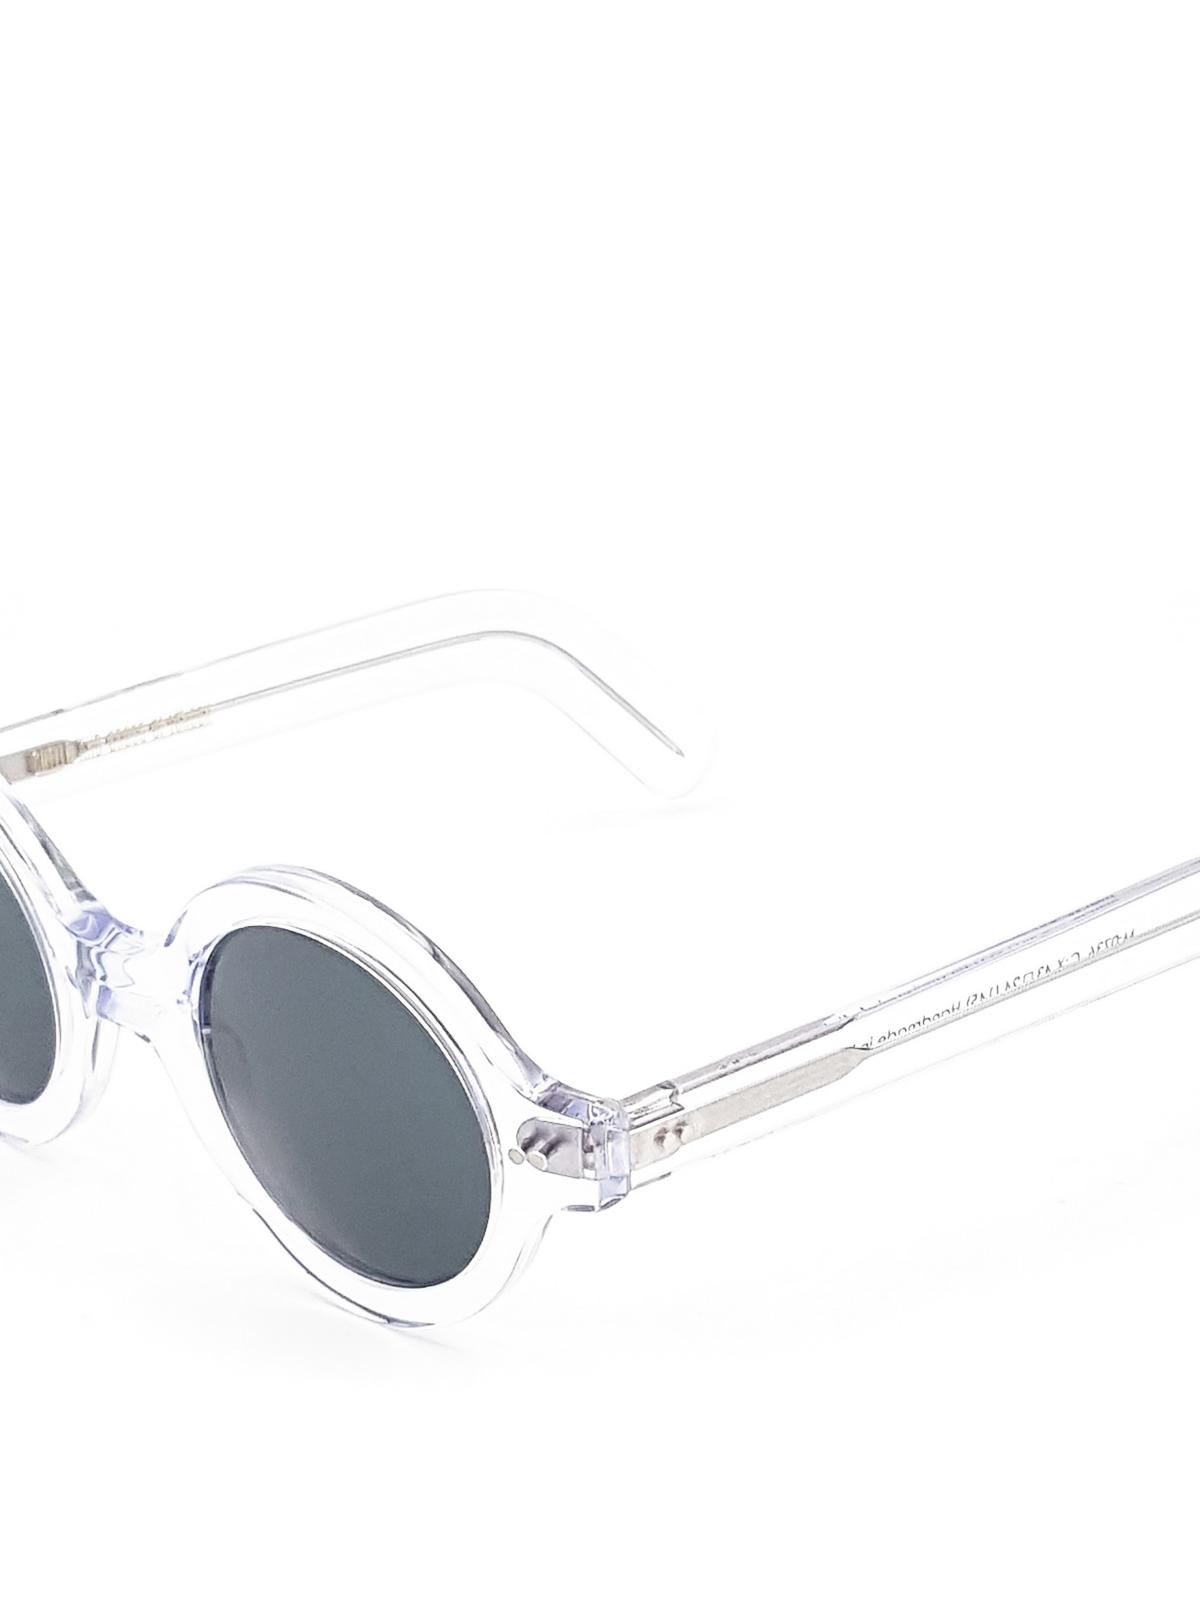 ce3becbcc5 iKRIX CUTLER AND GROSS: Gafas de sol - Gafas De Sol Cristales Para Unisex